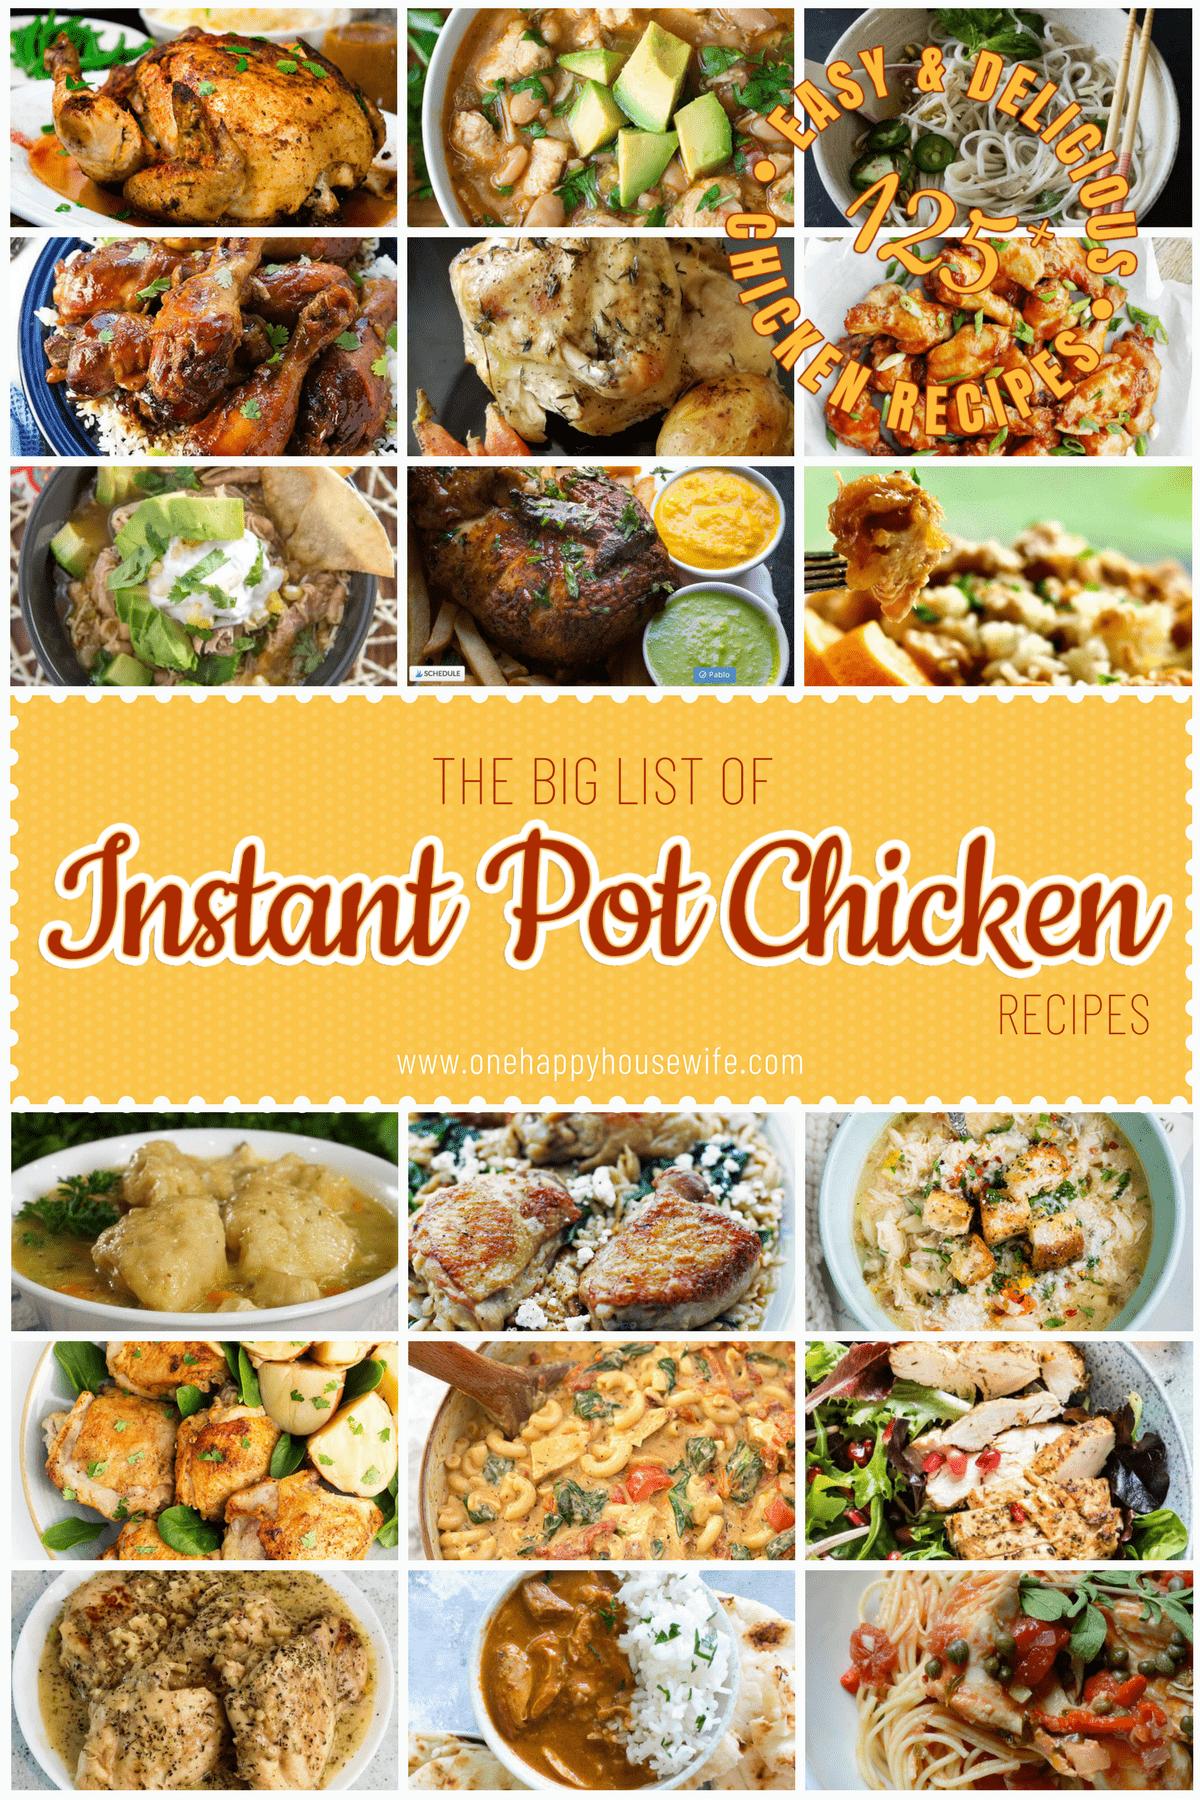 The Big List Of Instant Pot Chicken Recipes Instant Pot Dinner Recipes Easy Instant Pot Recipes Best Instant Pot Recipe